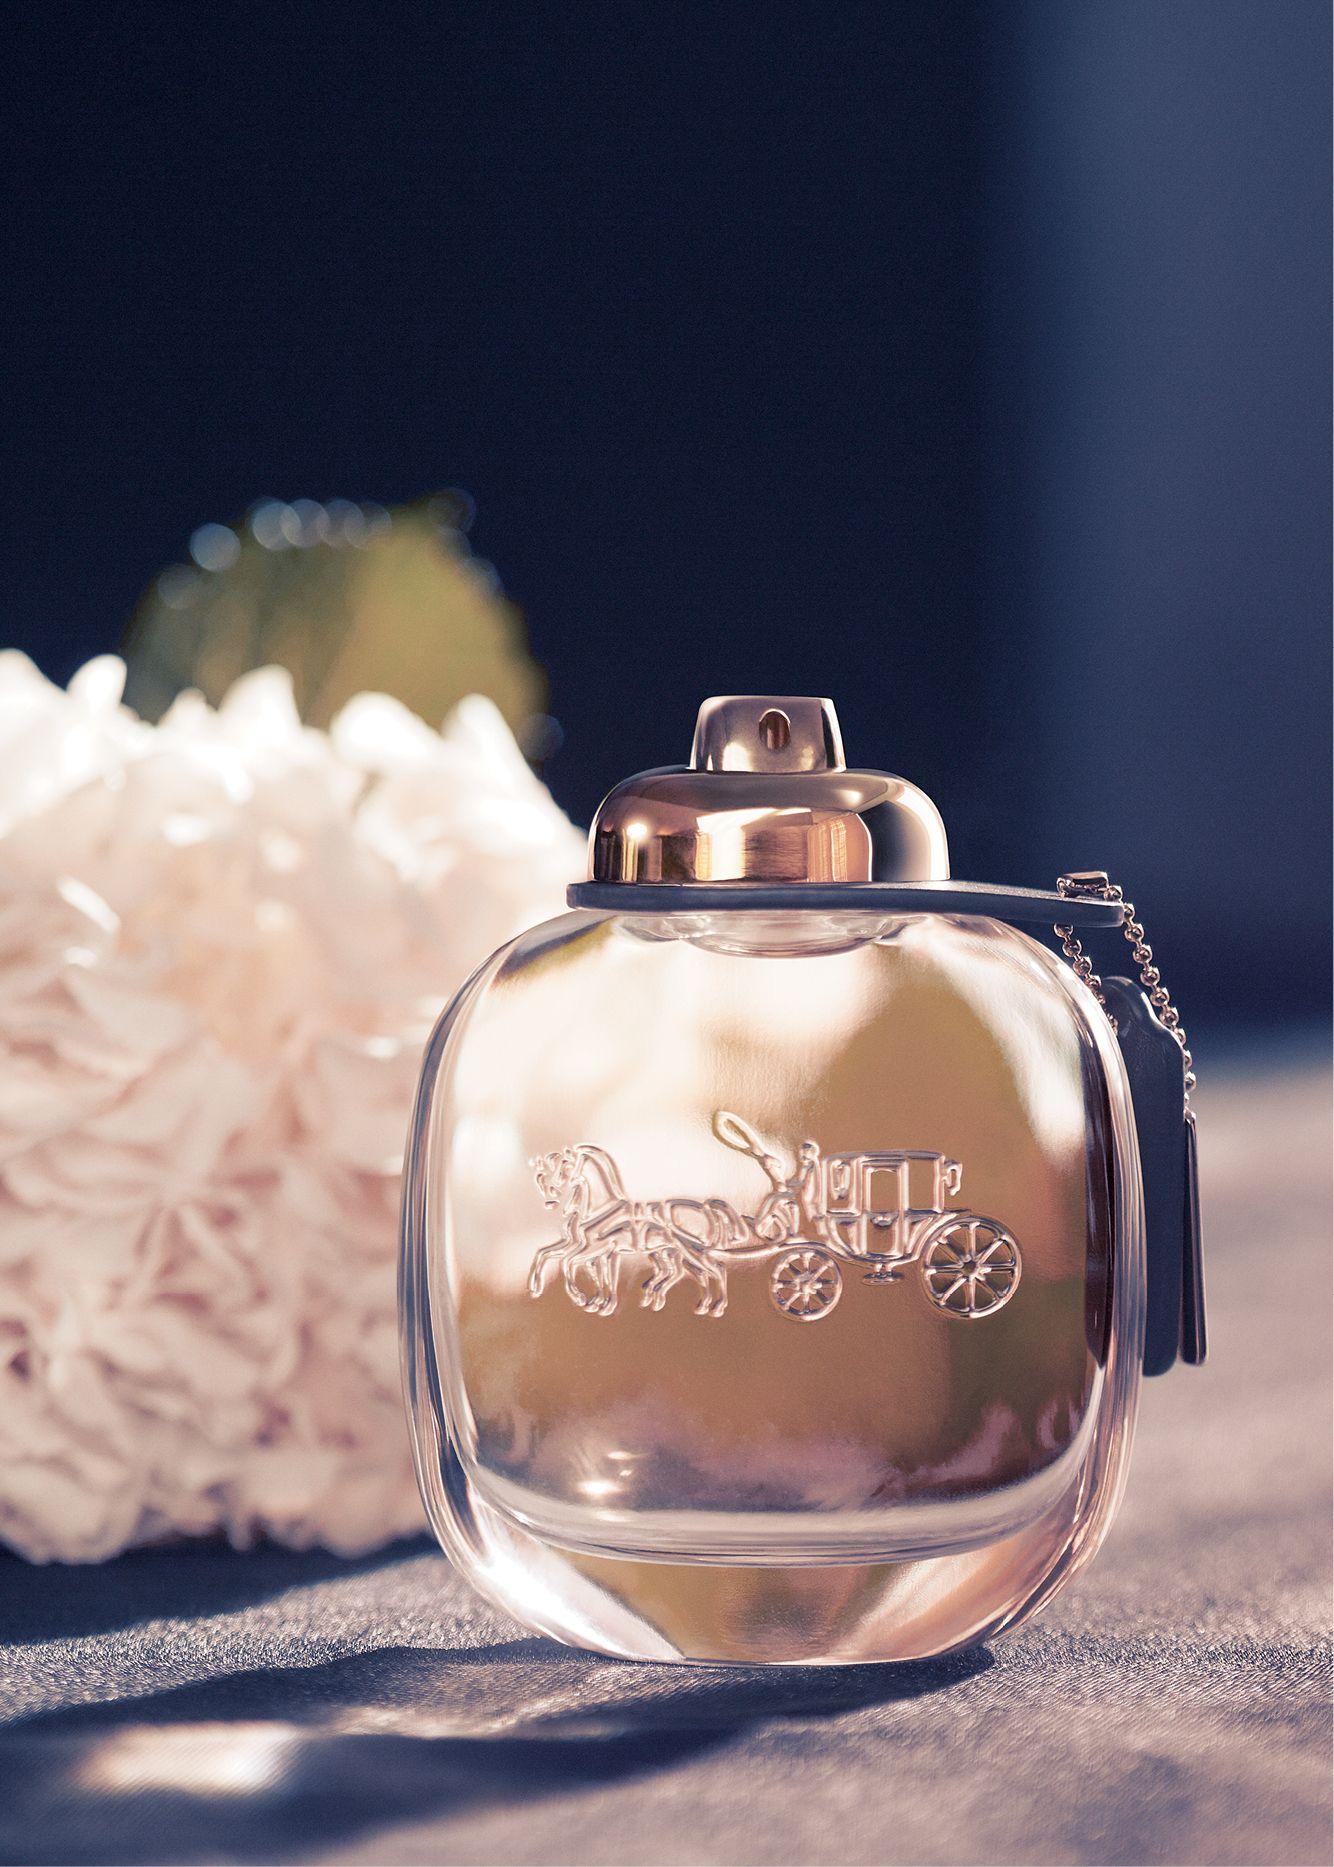 e89ae0575d39 EAU DE PARFUM 30mL | #COACHTHEFRAGRANCE | Coach perfume, Perfume ...